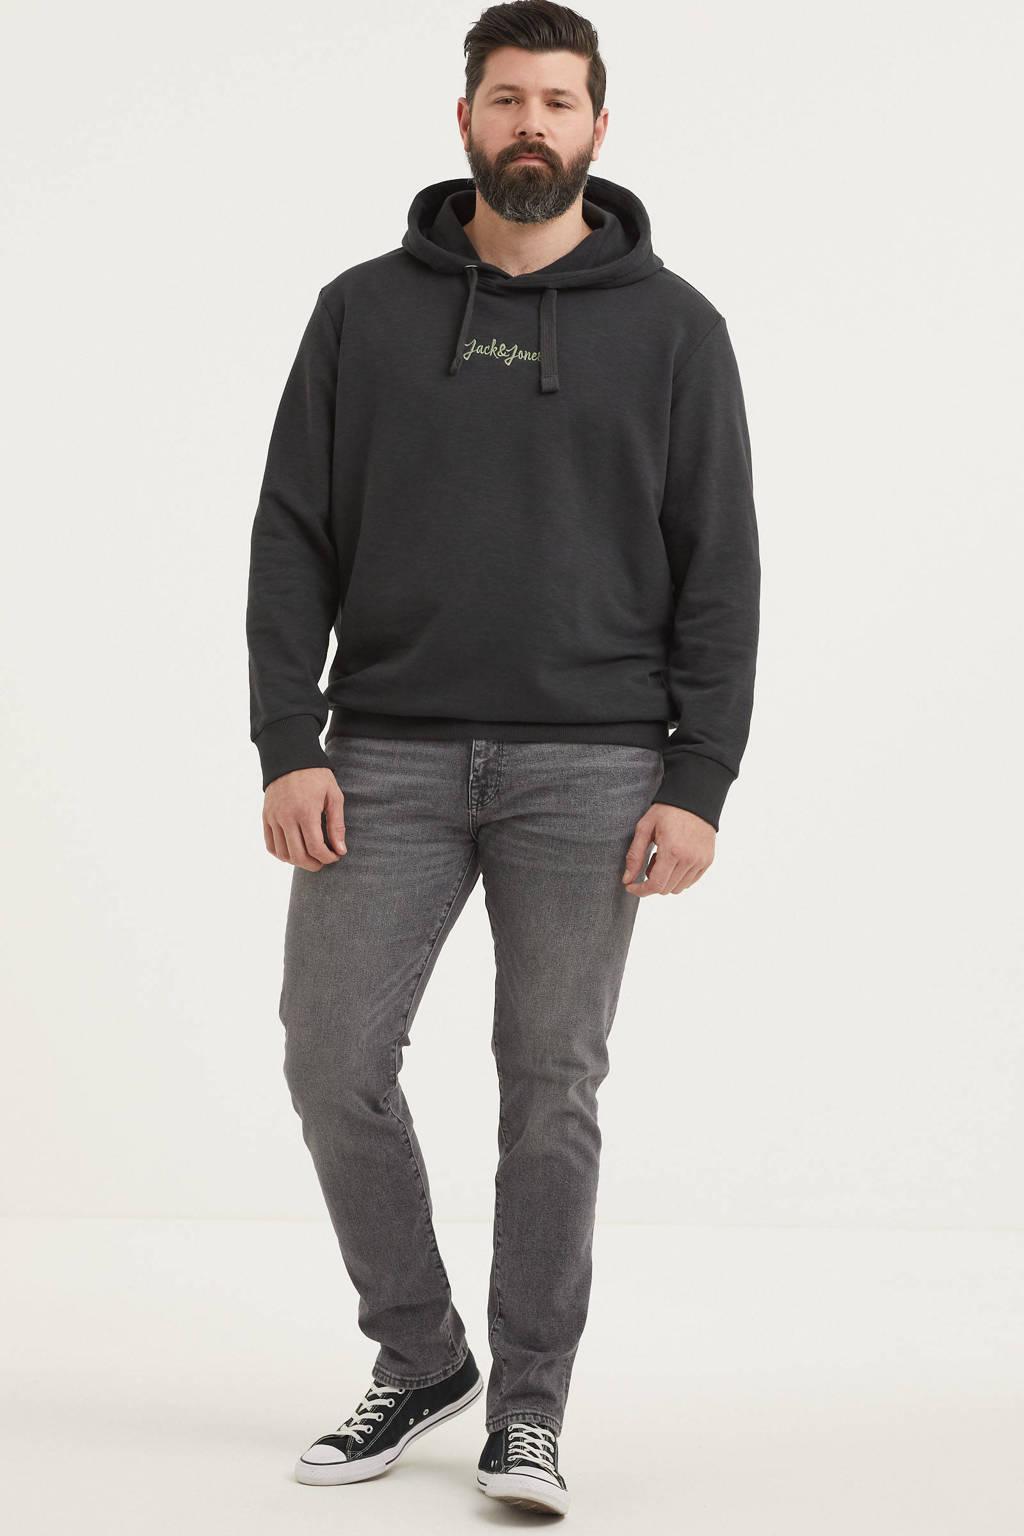 JACK & JONES PLUS SIZE hoodie Stockholm Plus Size zwart, Zwart